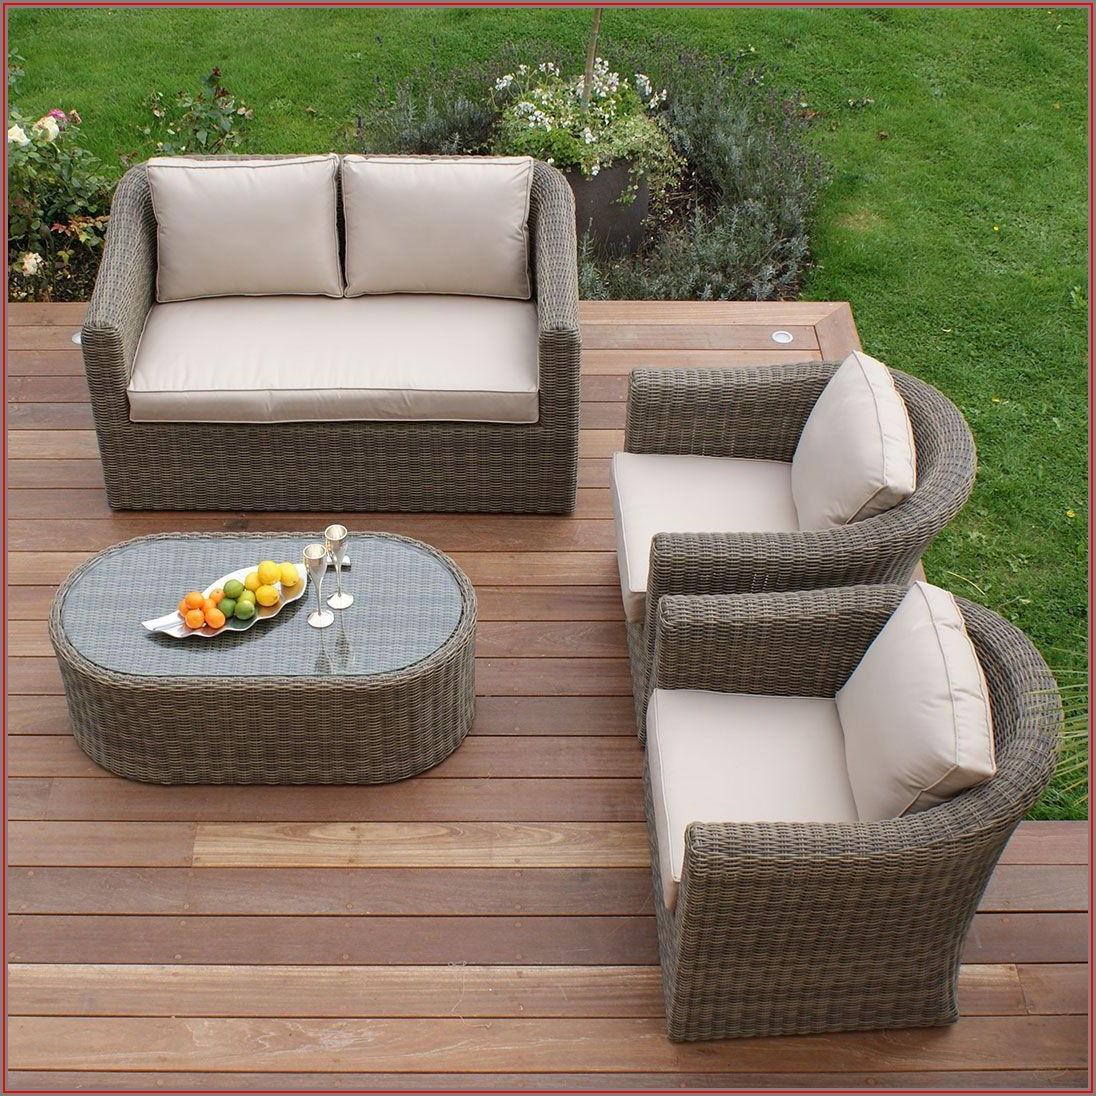 2 Seater Patio Furniture